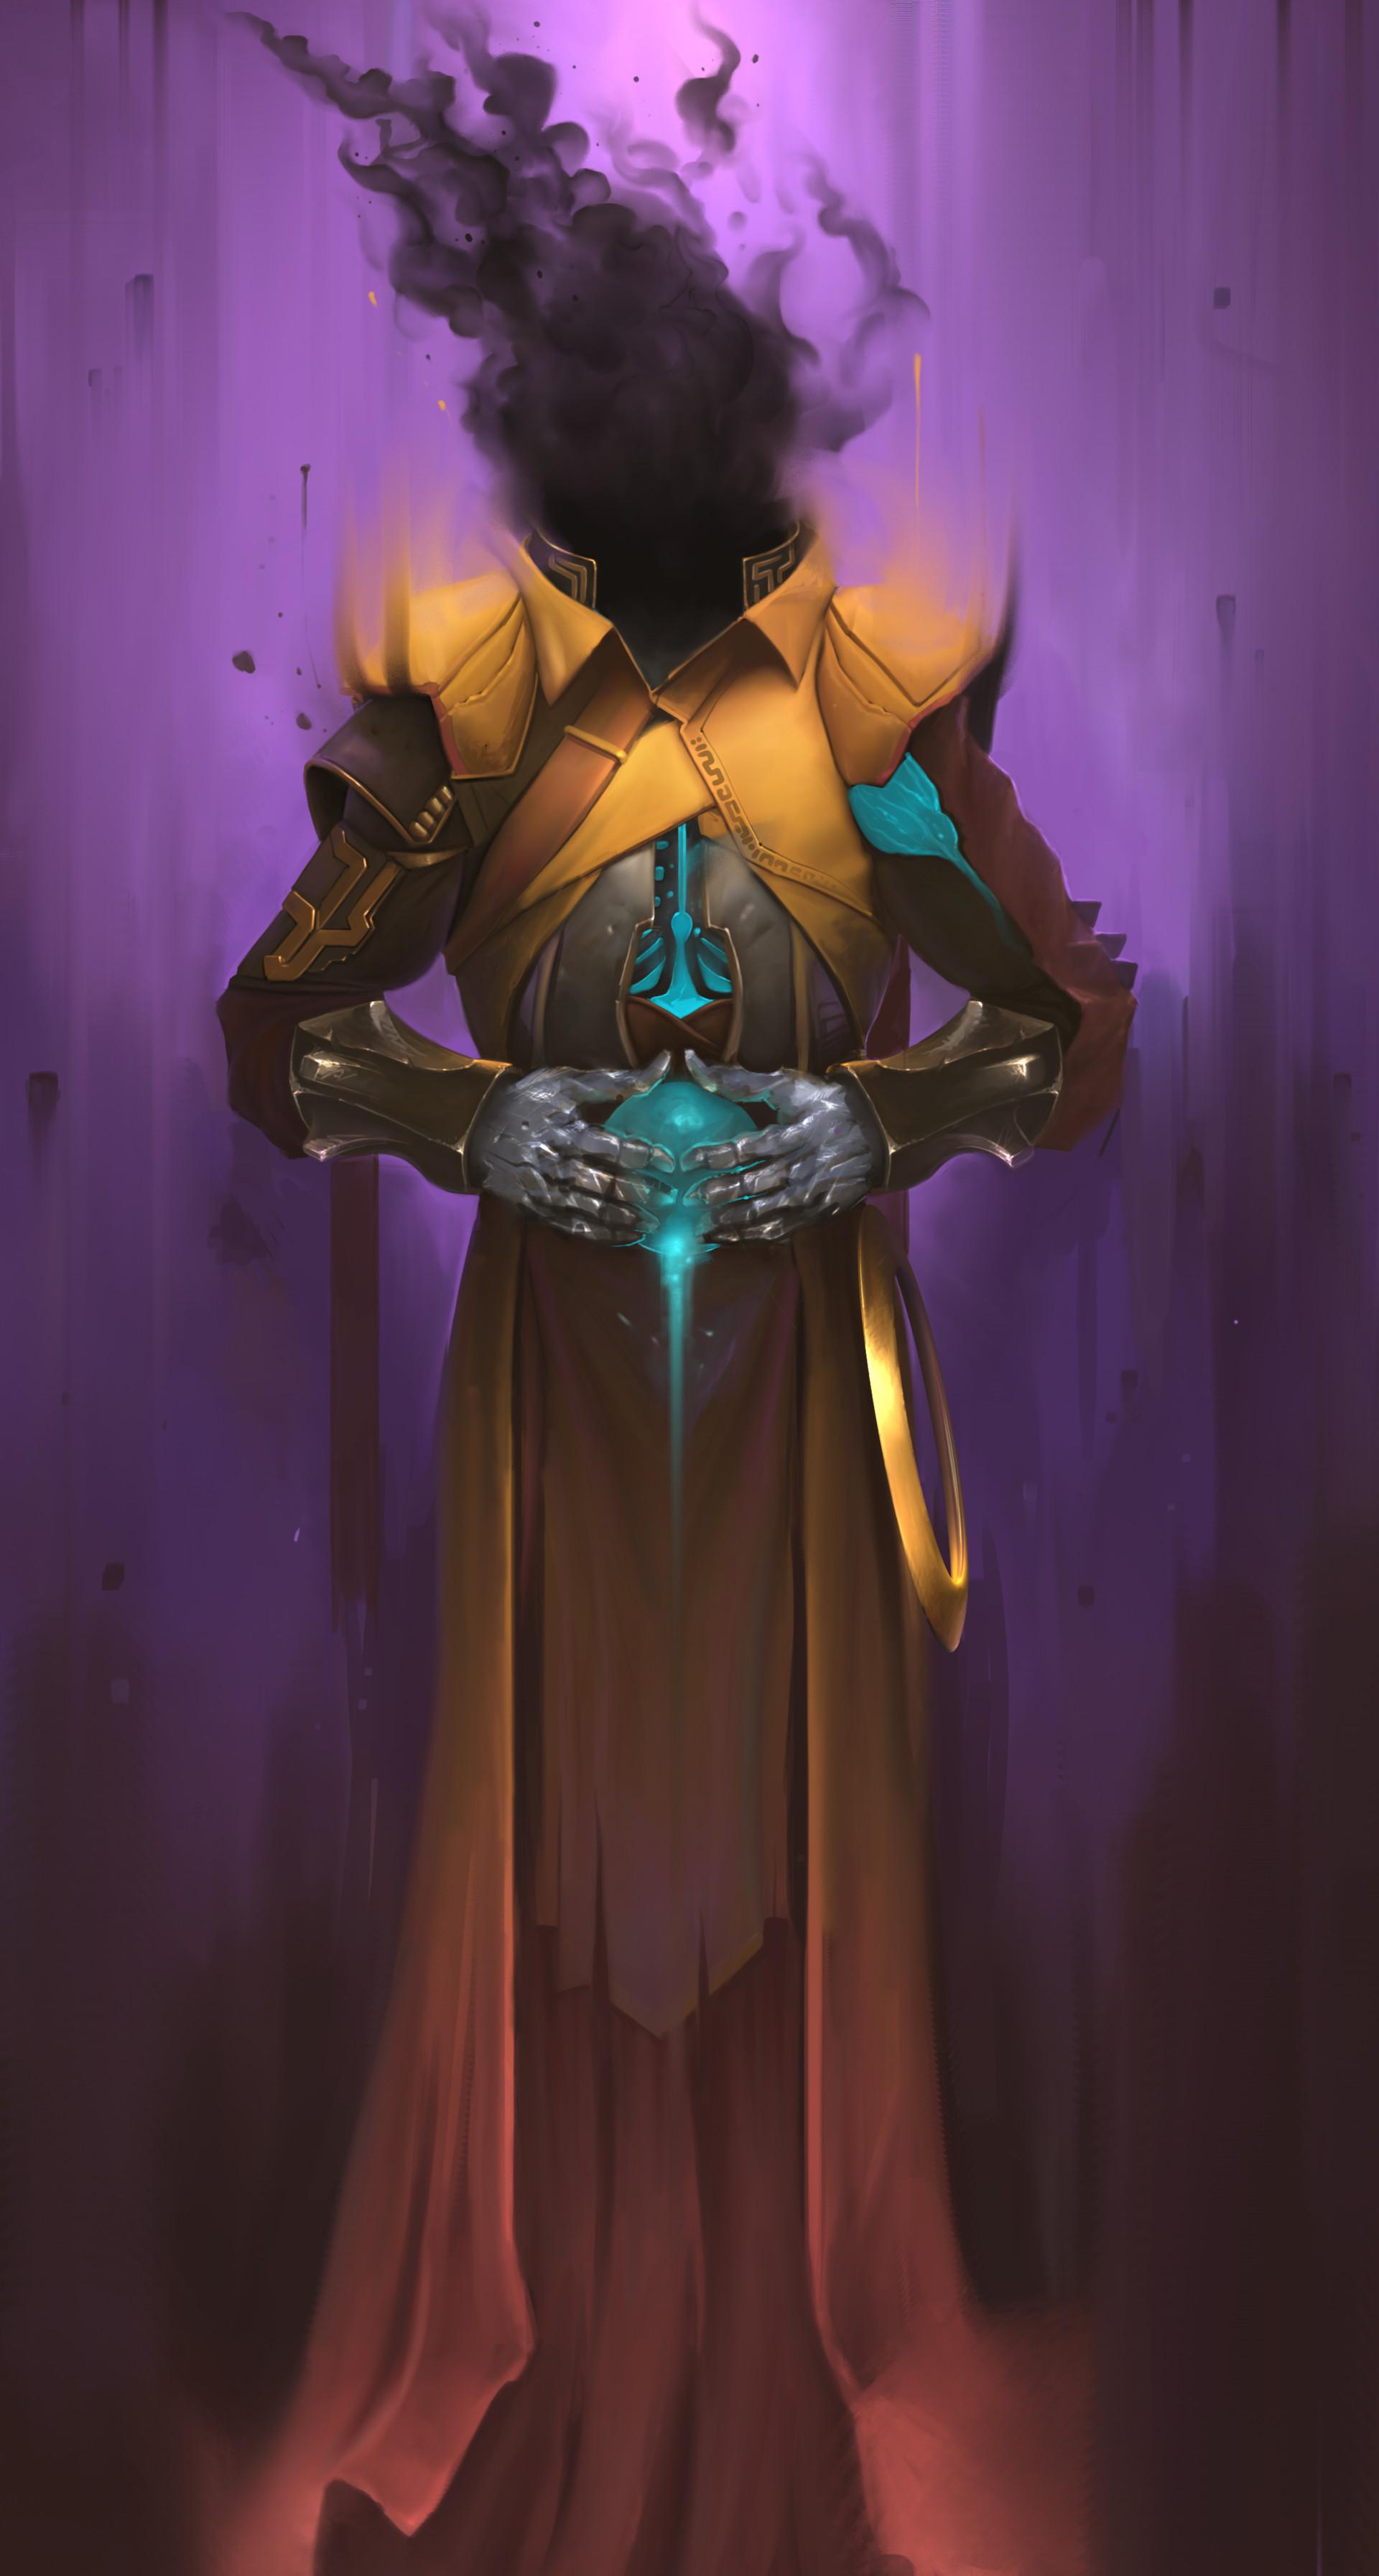 General 1920x3587 Vladimir Matiukhin dark wizard hood dress